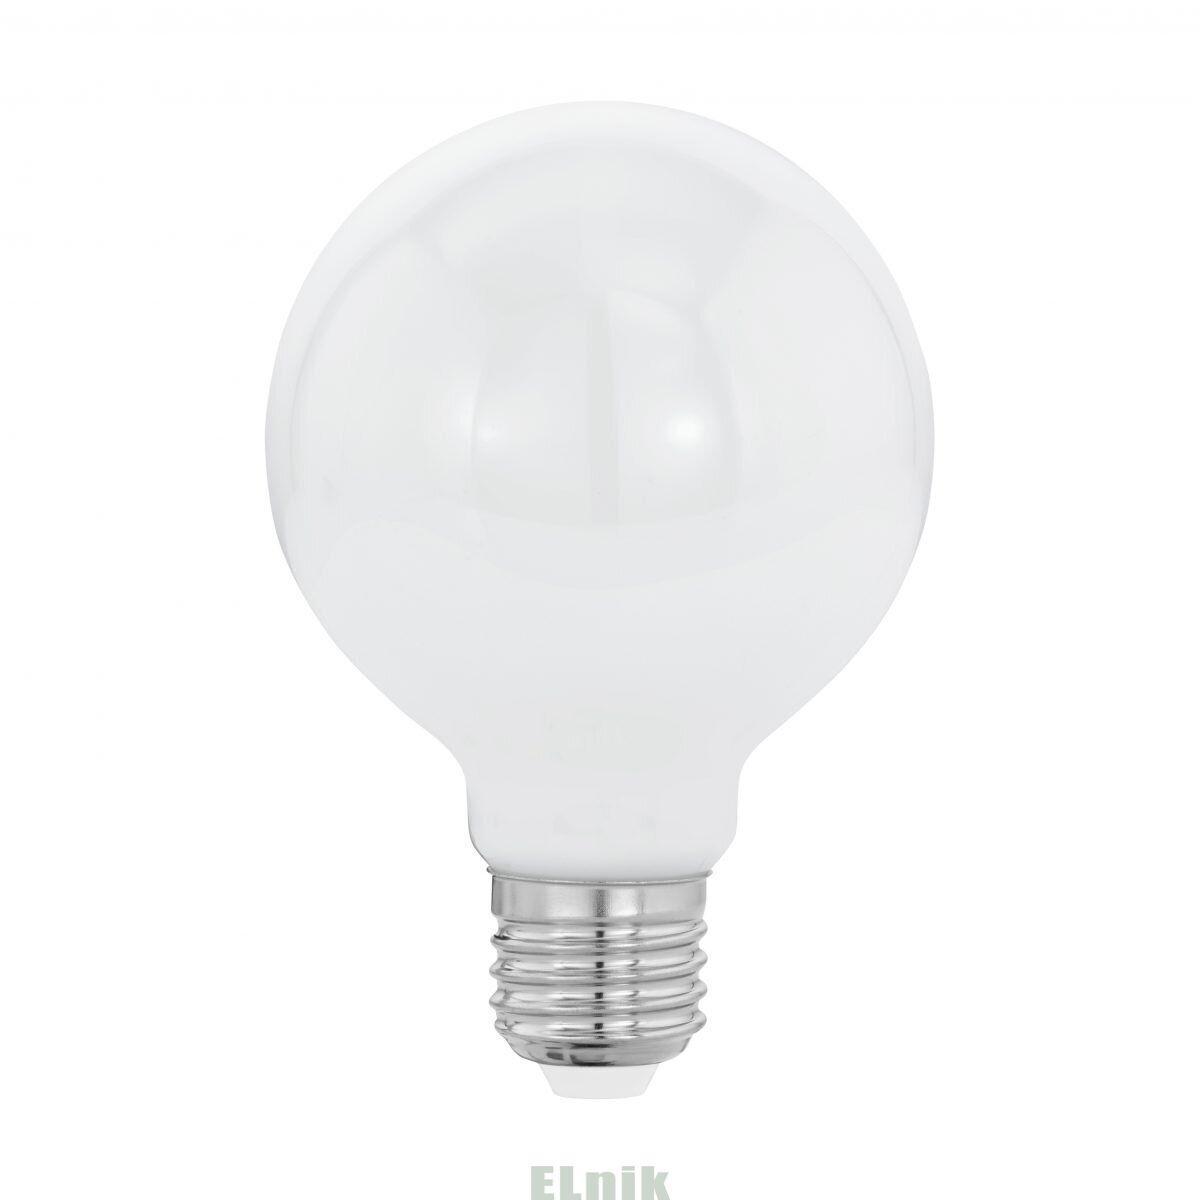 "Лампа светодиодная филаментная ""Милки"" опаловое стекло LM LED E27 G80 2700K, Eglo [11598]"